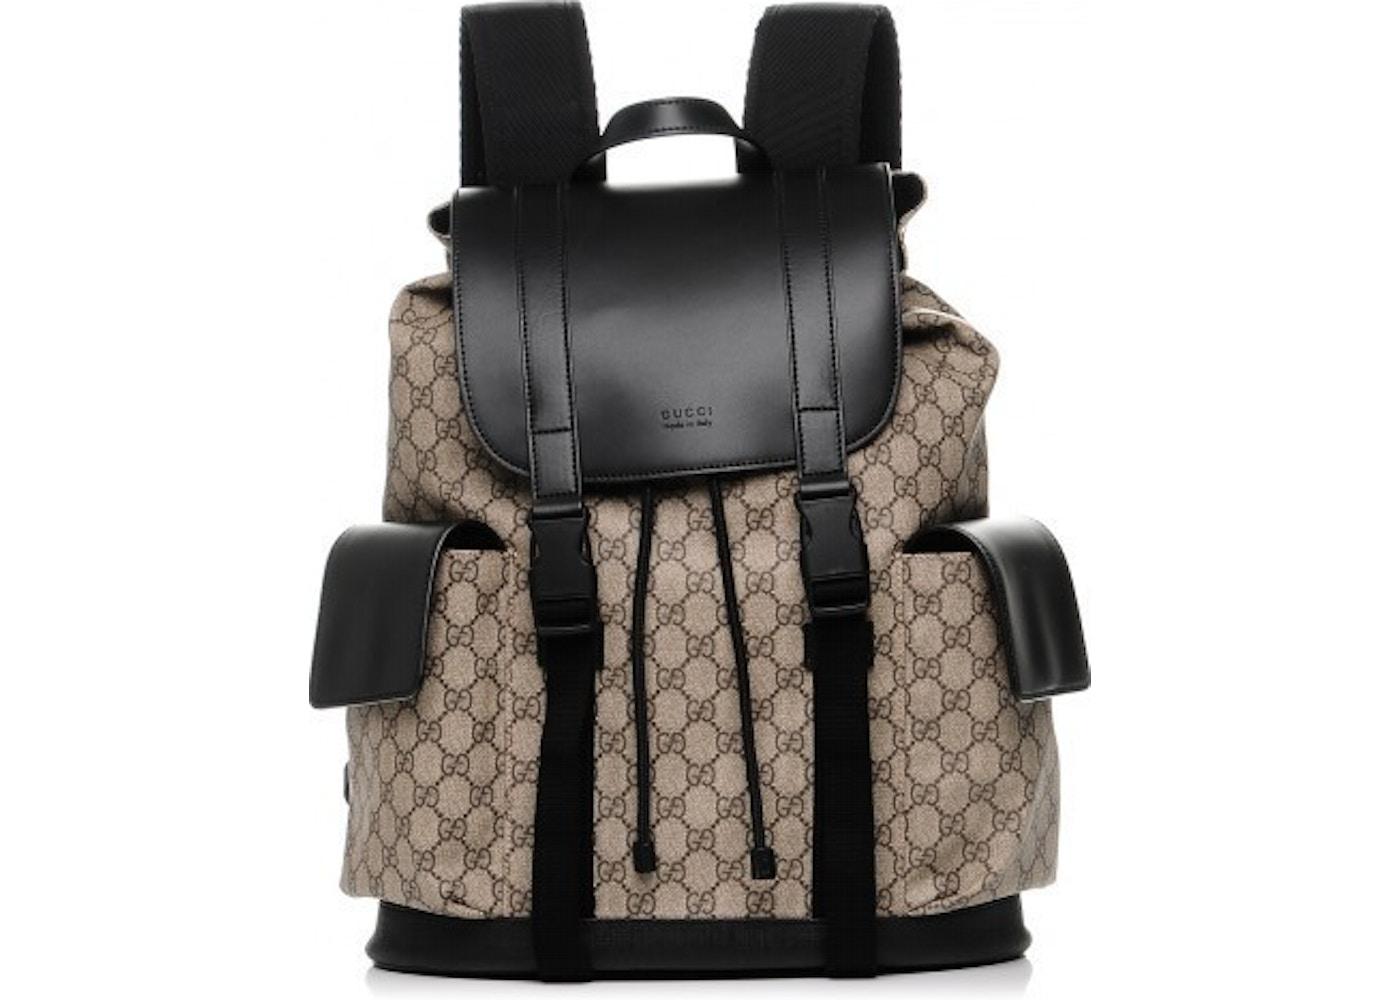 f2eadf80ed7e0 Buy & Sell Gucci Other Handbags - Highest Bid